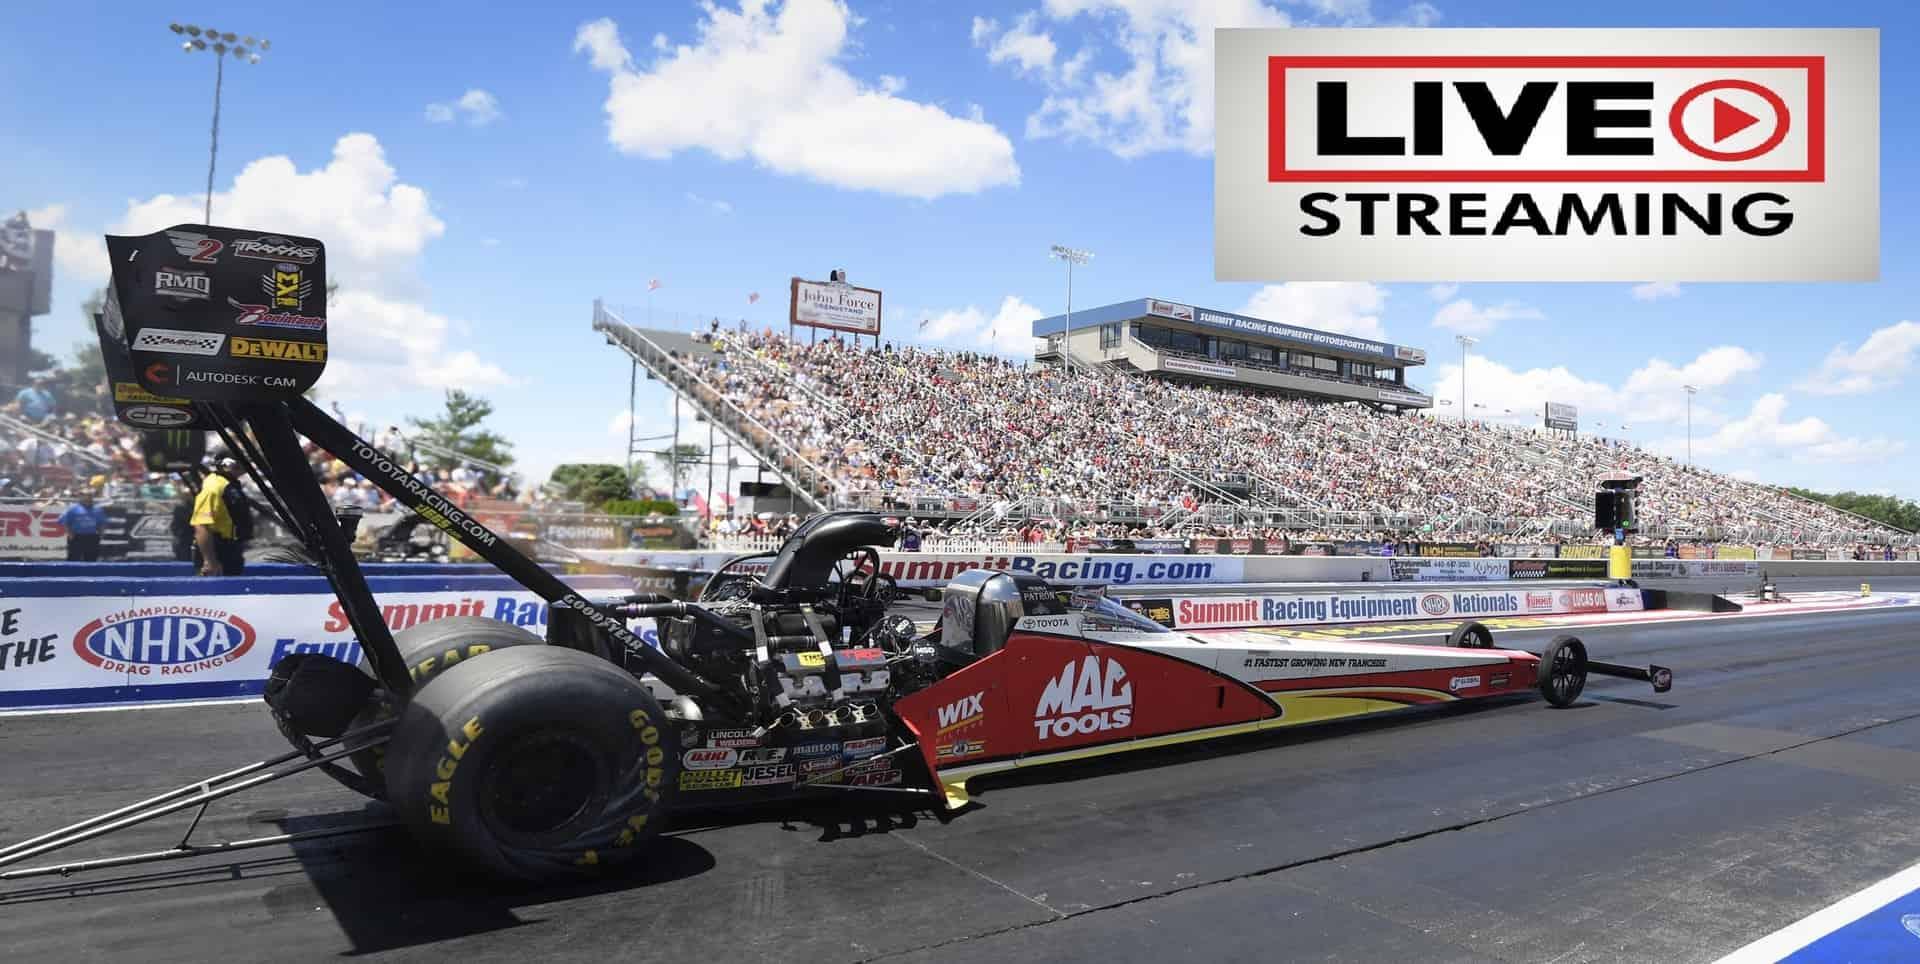 Nhra Bandimere Racing Live Stream